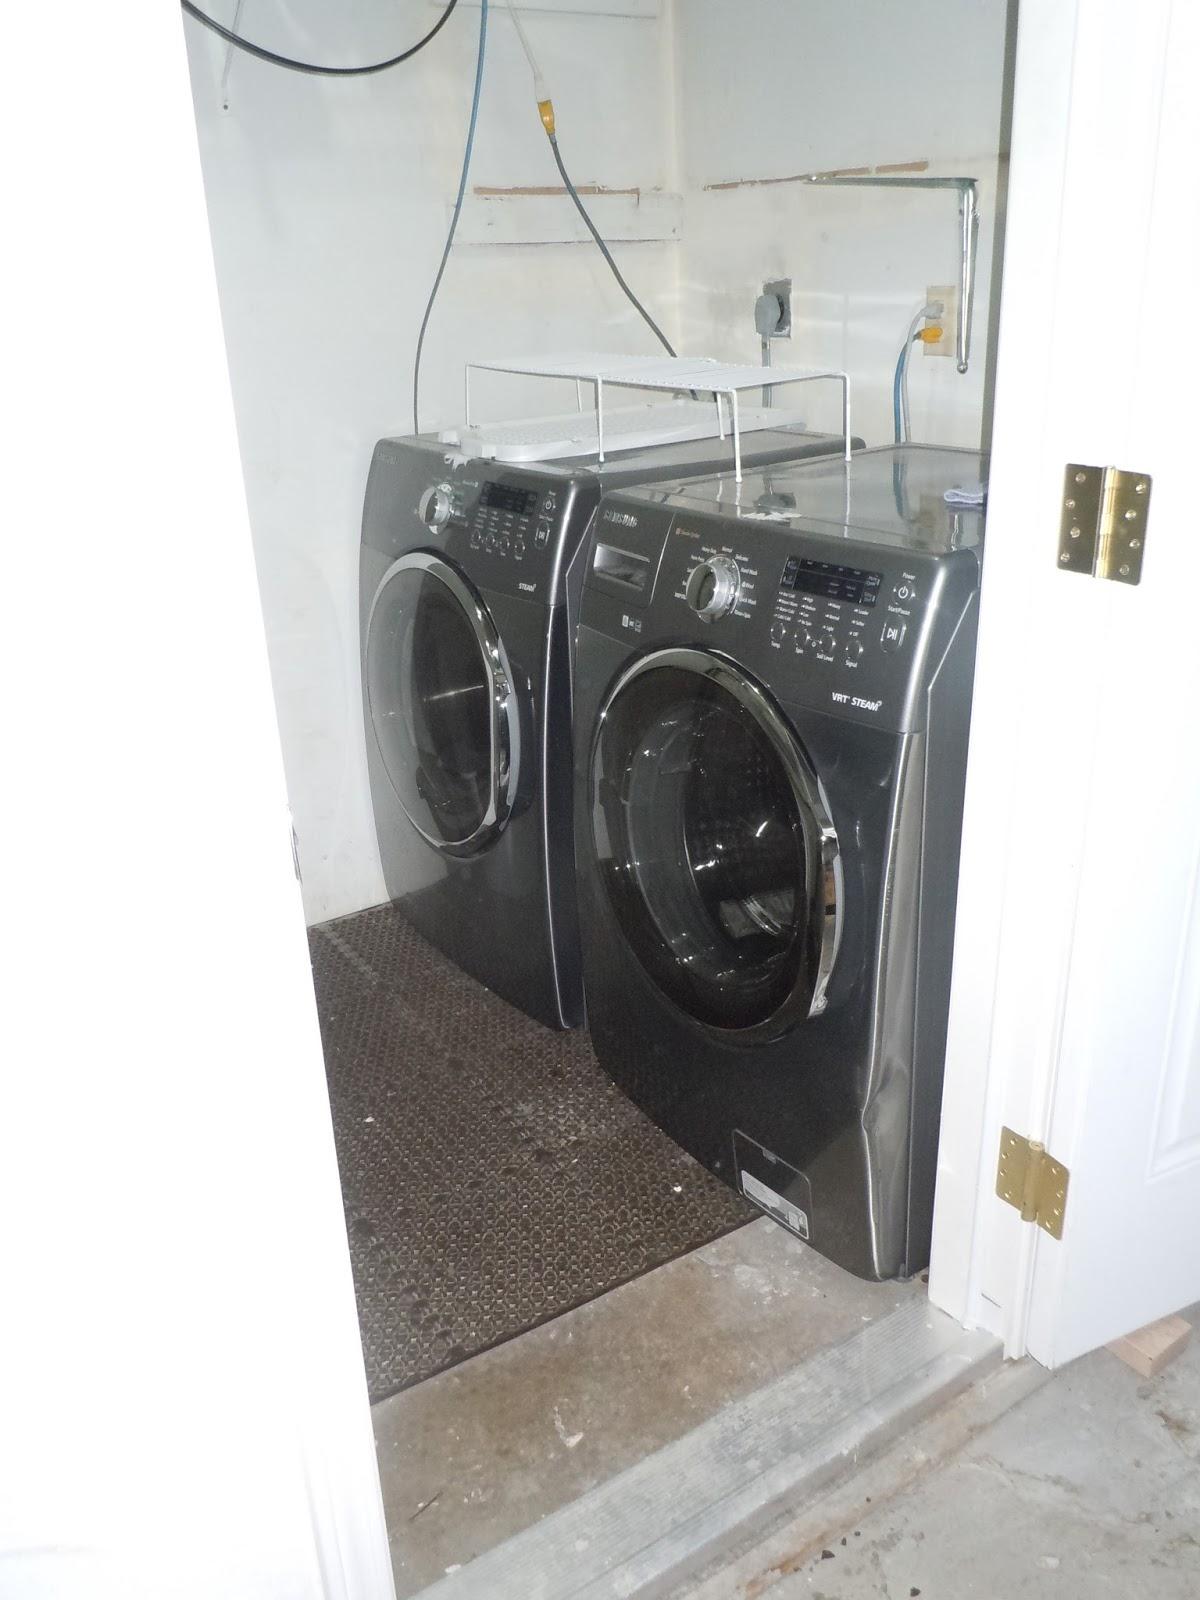 retail sidekick for kicks pedestals pedtacular lg offer washer off article laundry pedestal